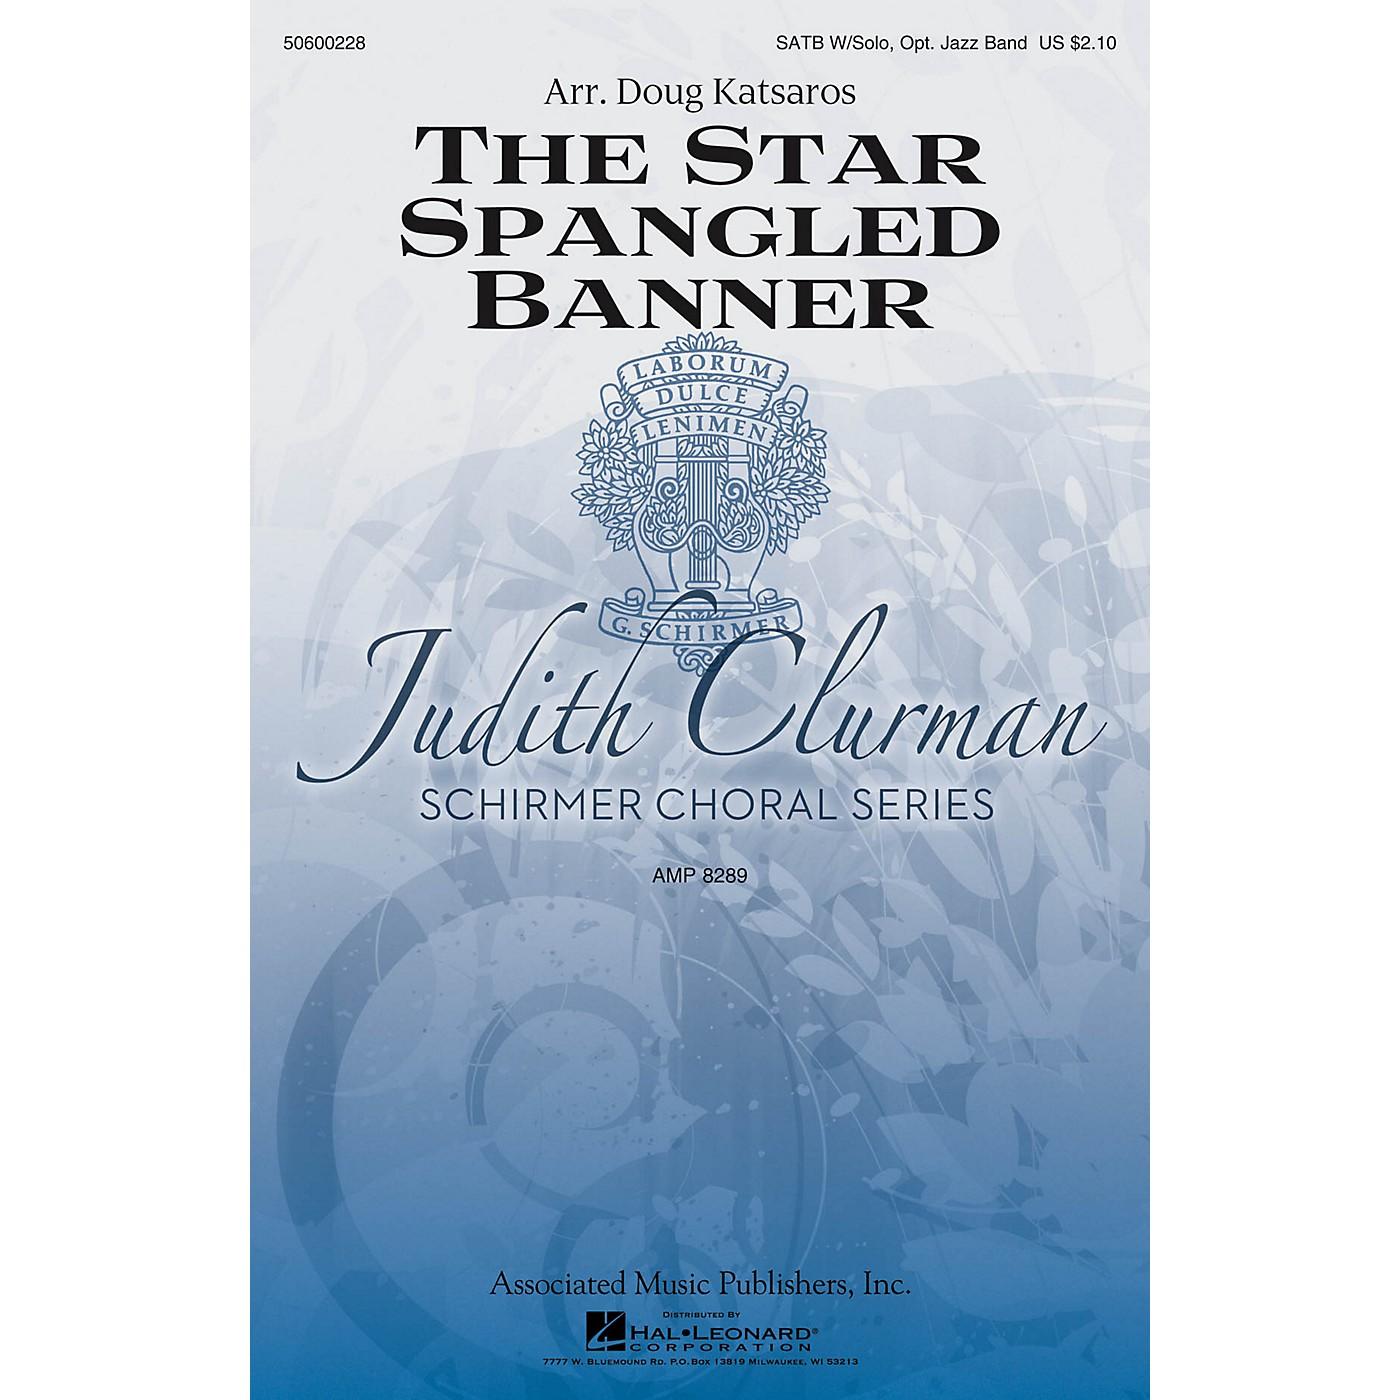 G. Schirmer The Star-Spangled Banner (Judith Clurman Choral Series) SATB arranged by Doug Katsaros thumbnail